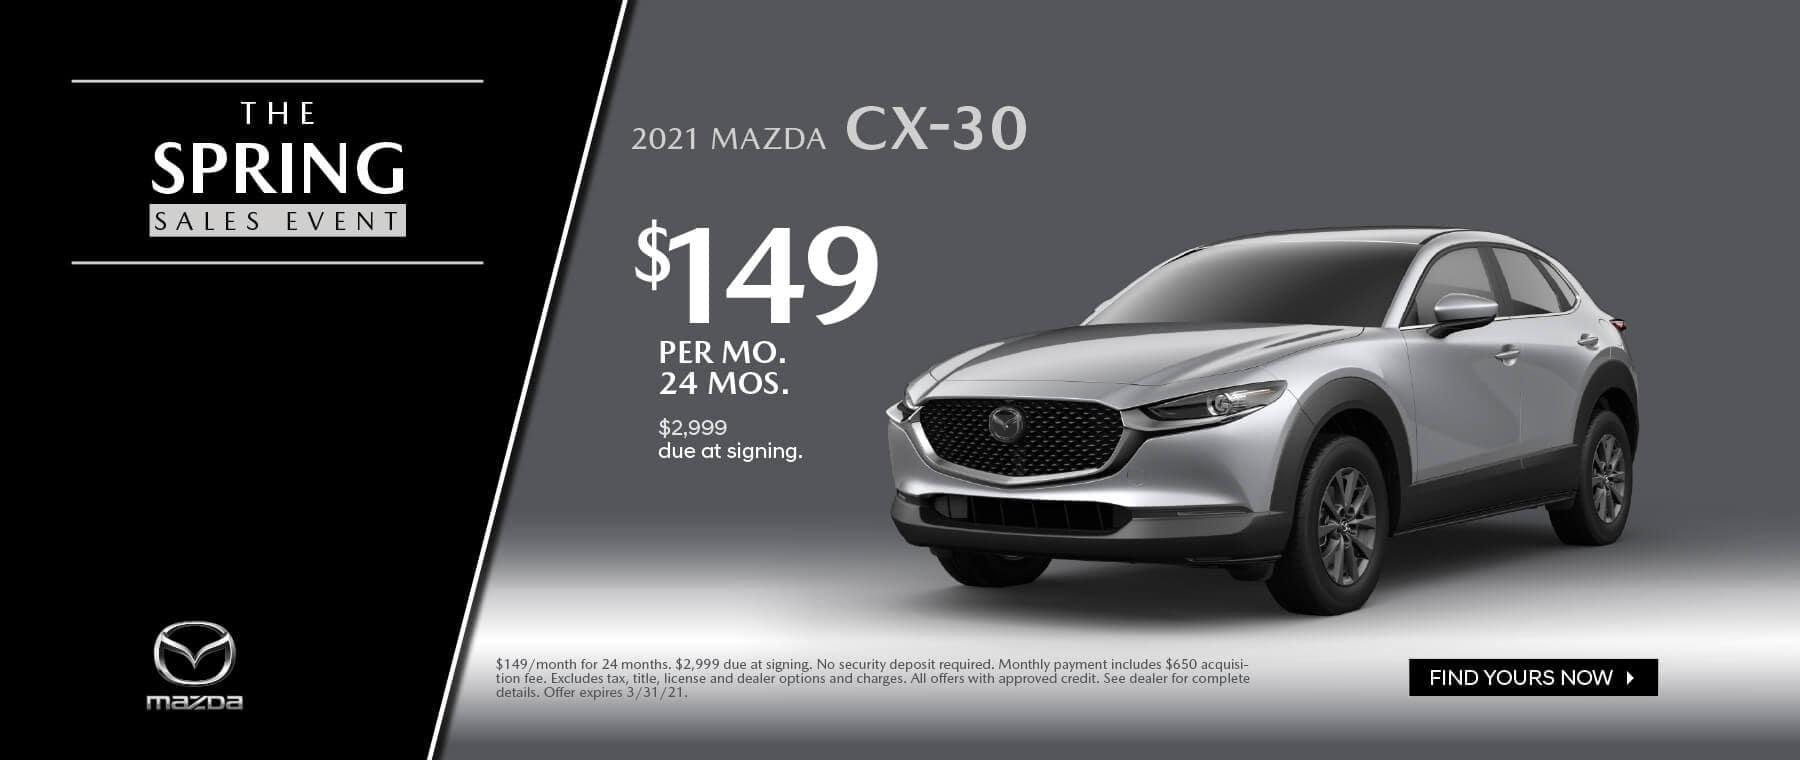 2021.02.24-Keffer-Mazda-MAR-Web-Banners-S51082vw-6